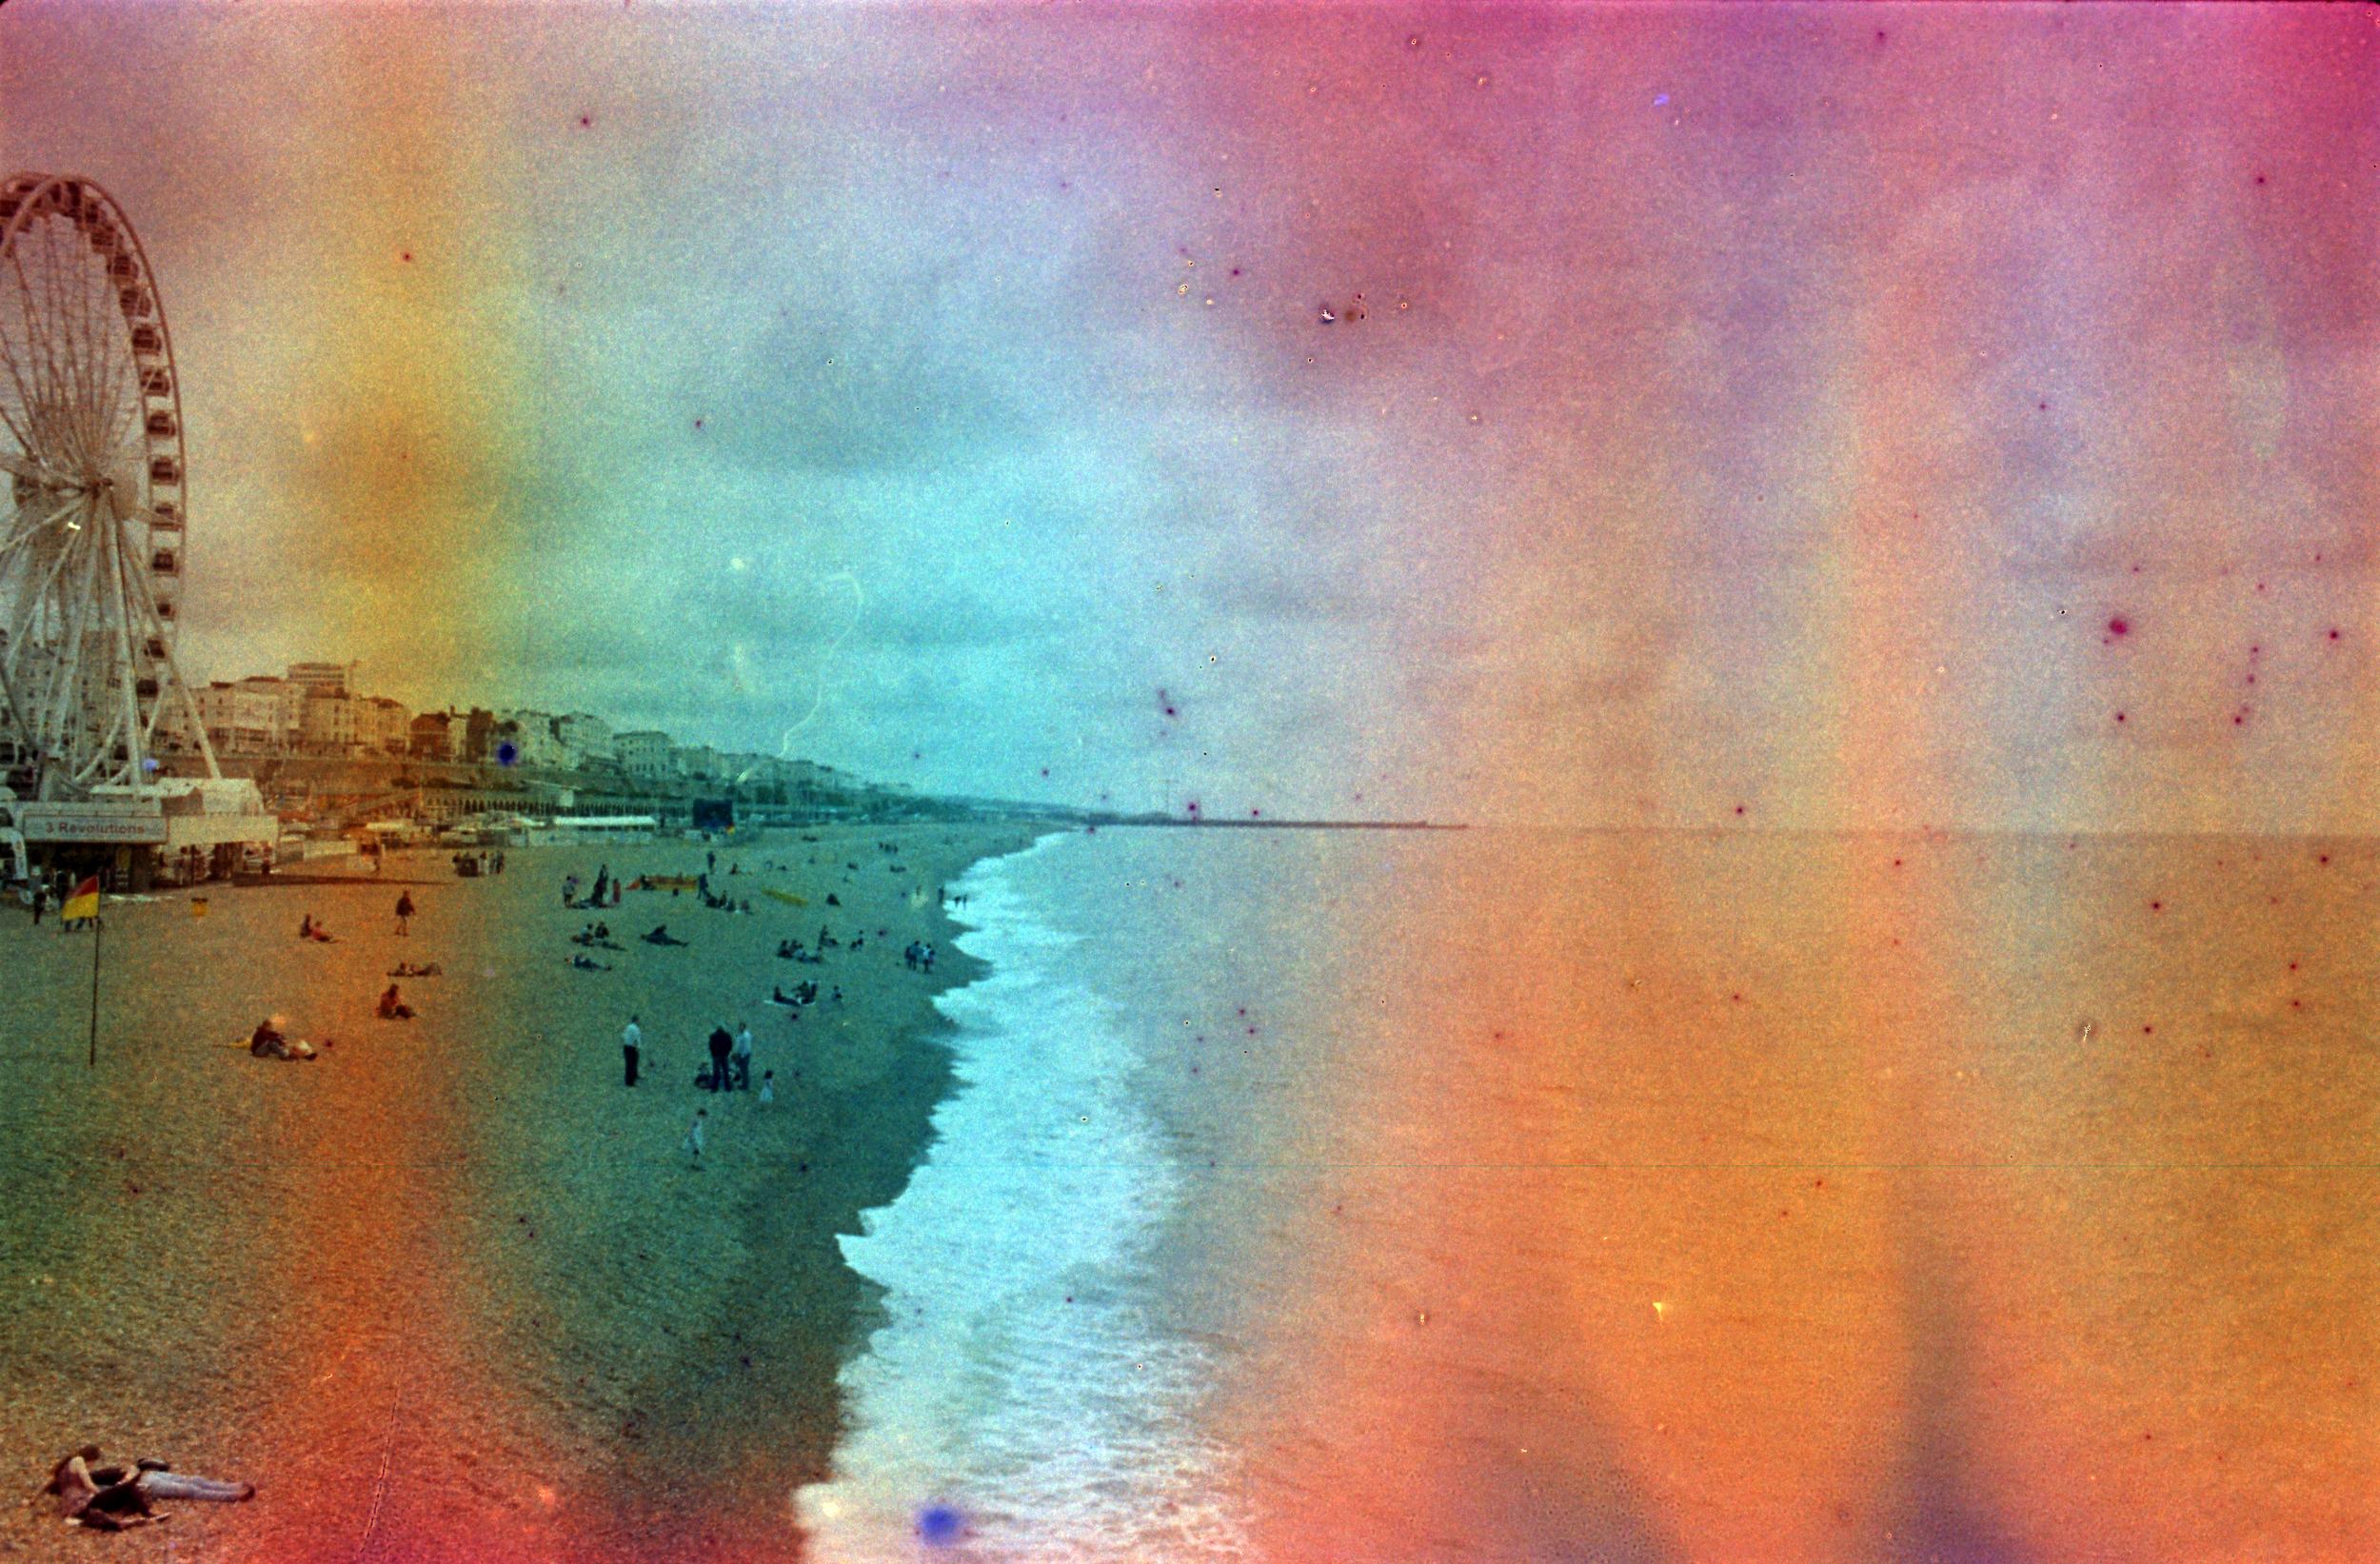 TomAug2-Kodak200-007.jpg